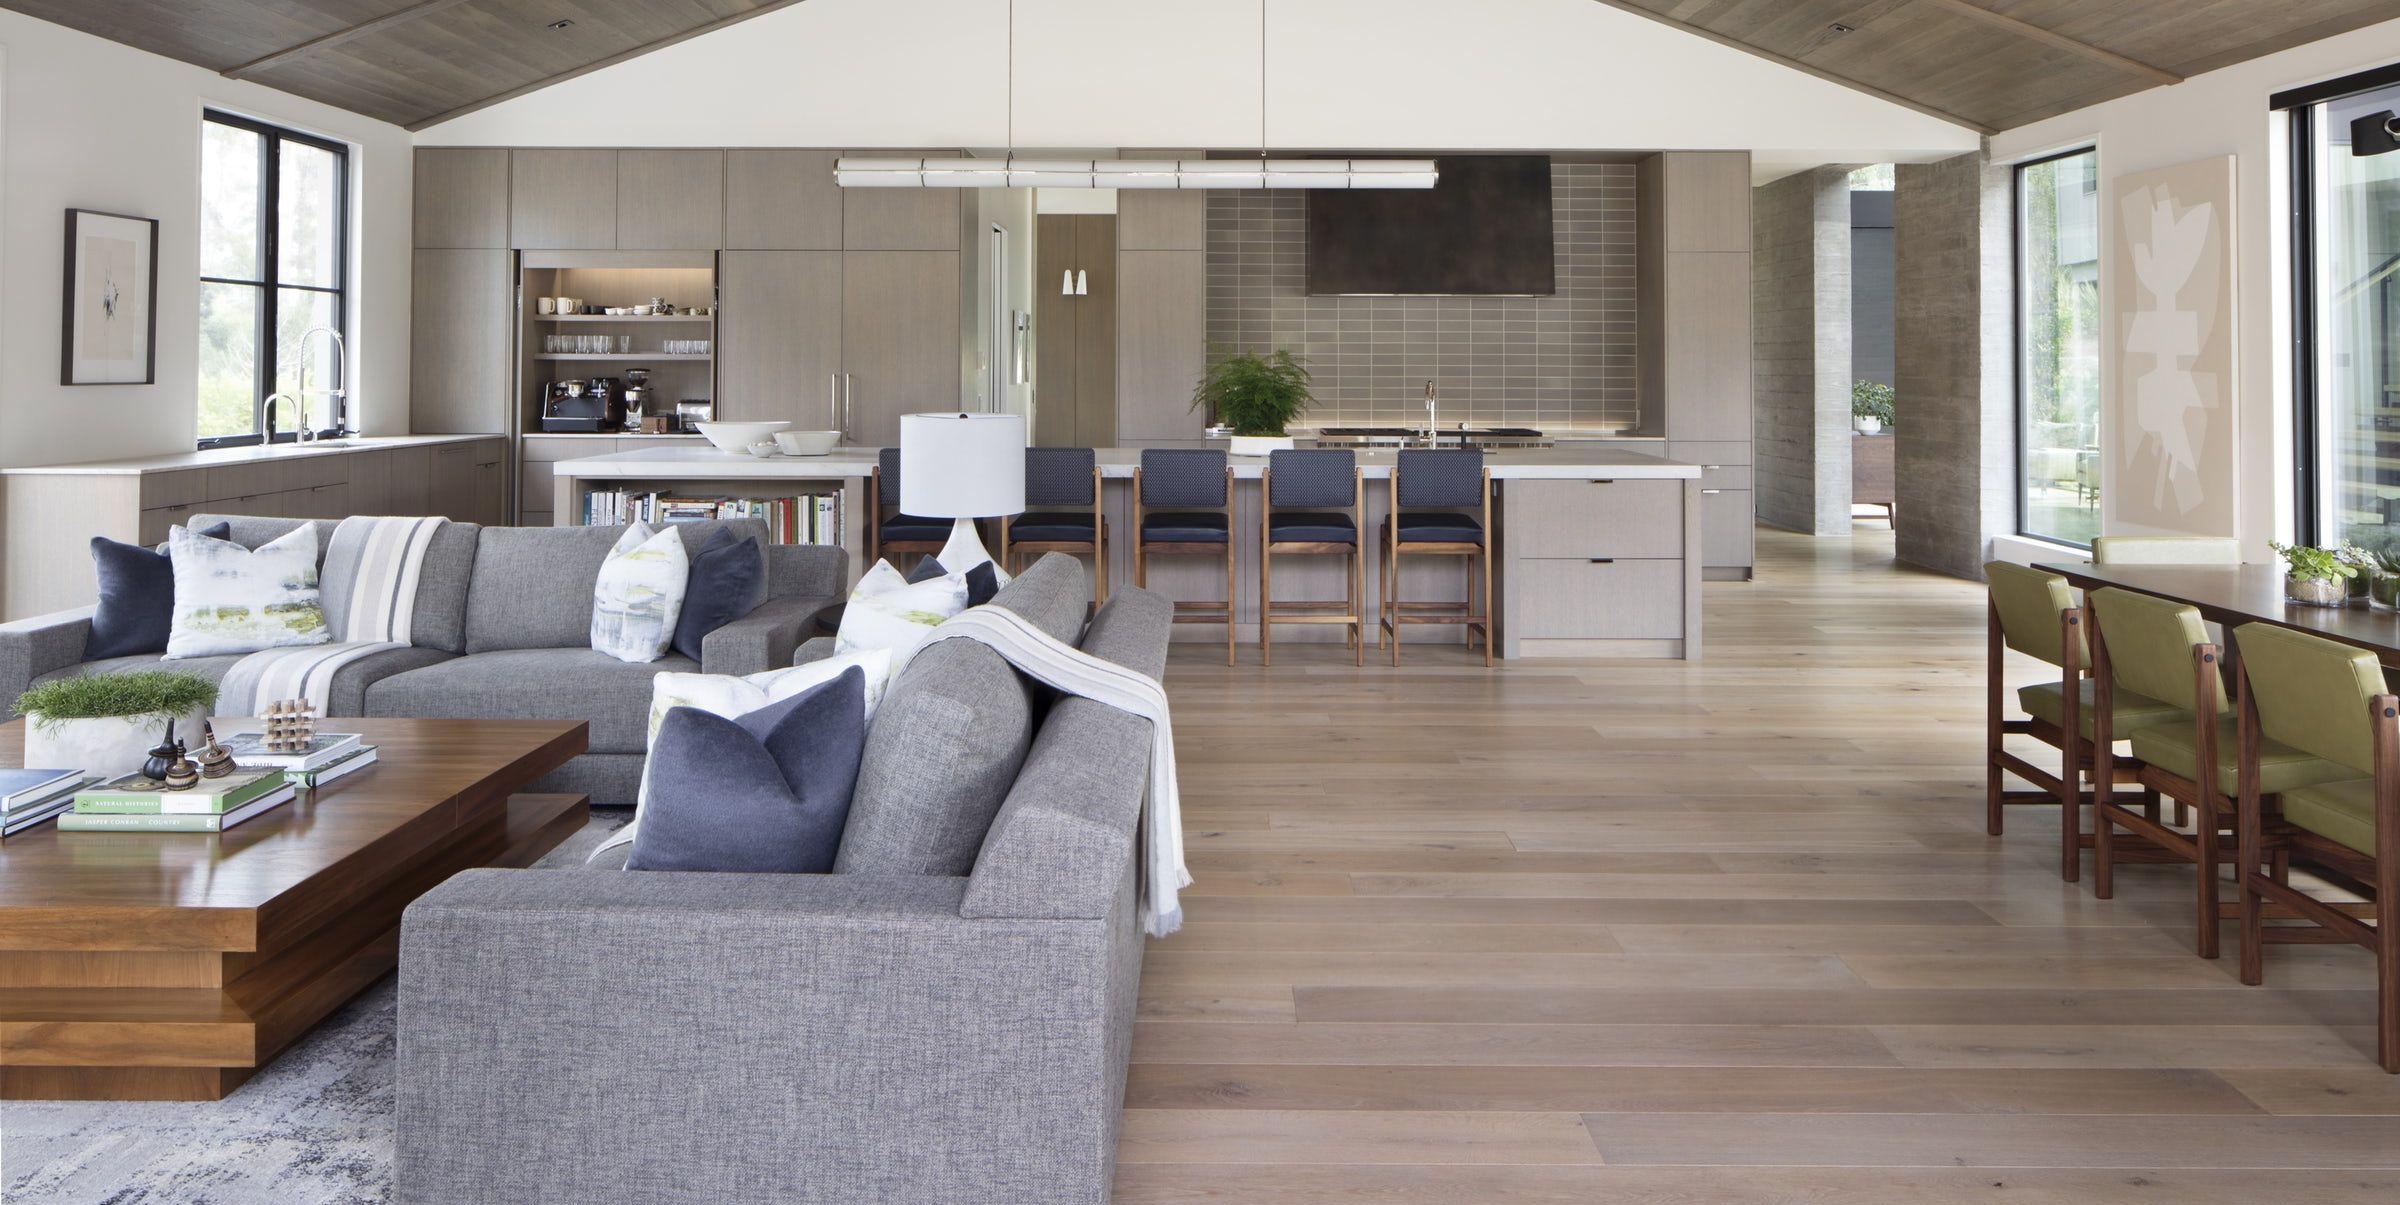 30+ Gorgeous Open Floor Plan Ideas